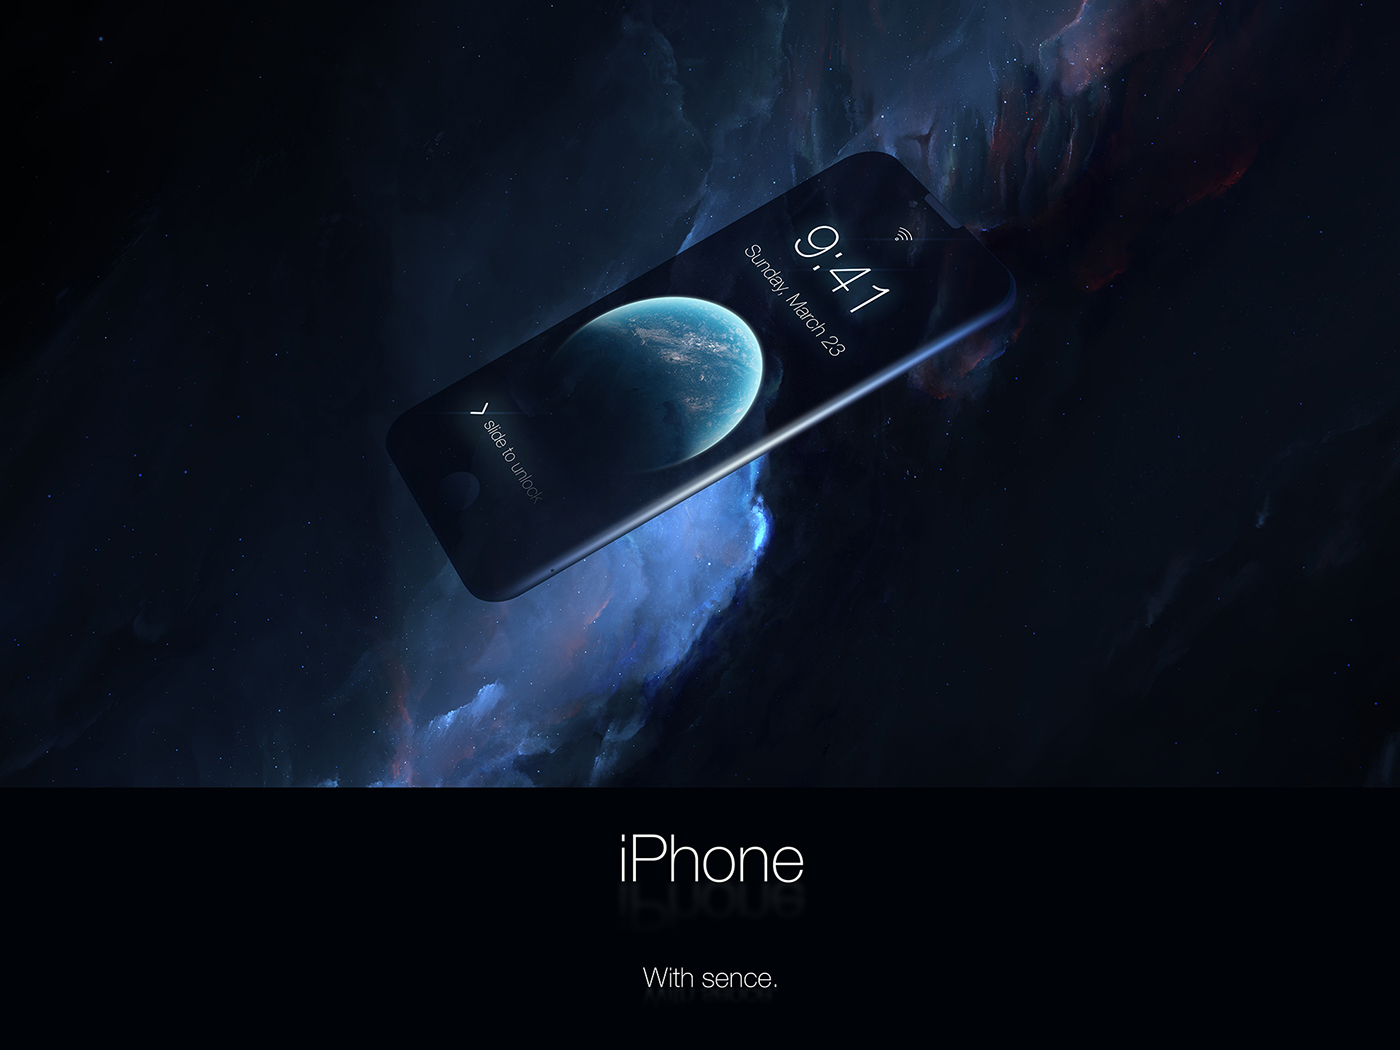 iPhone 7 concept Herman Haidin 001 - iPhone 7 : un concept futuriste en attendant sa sortie